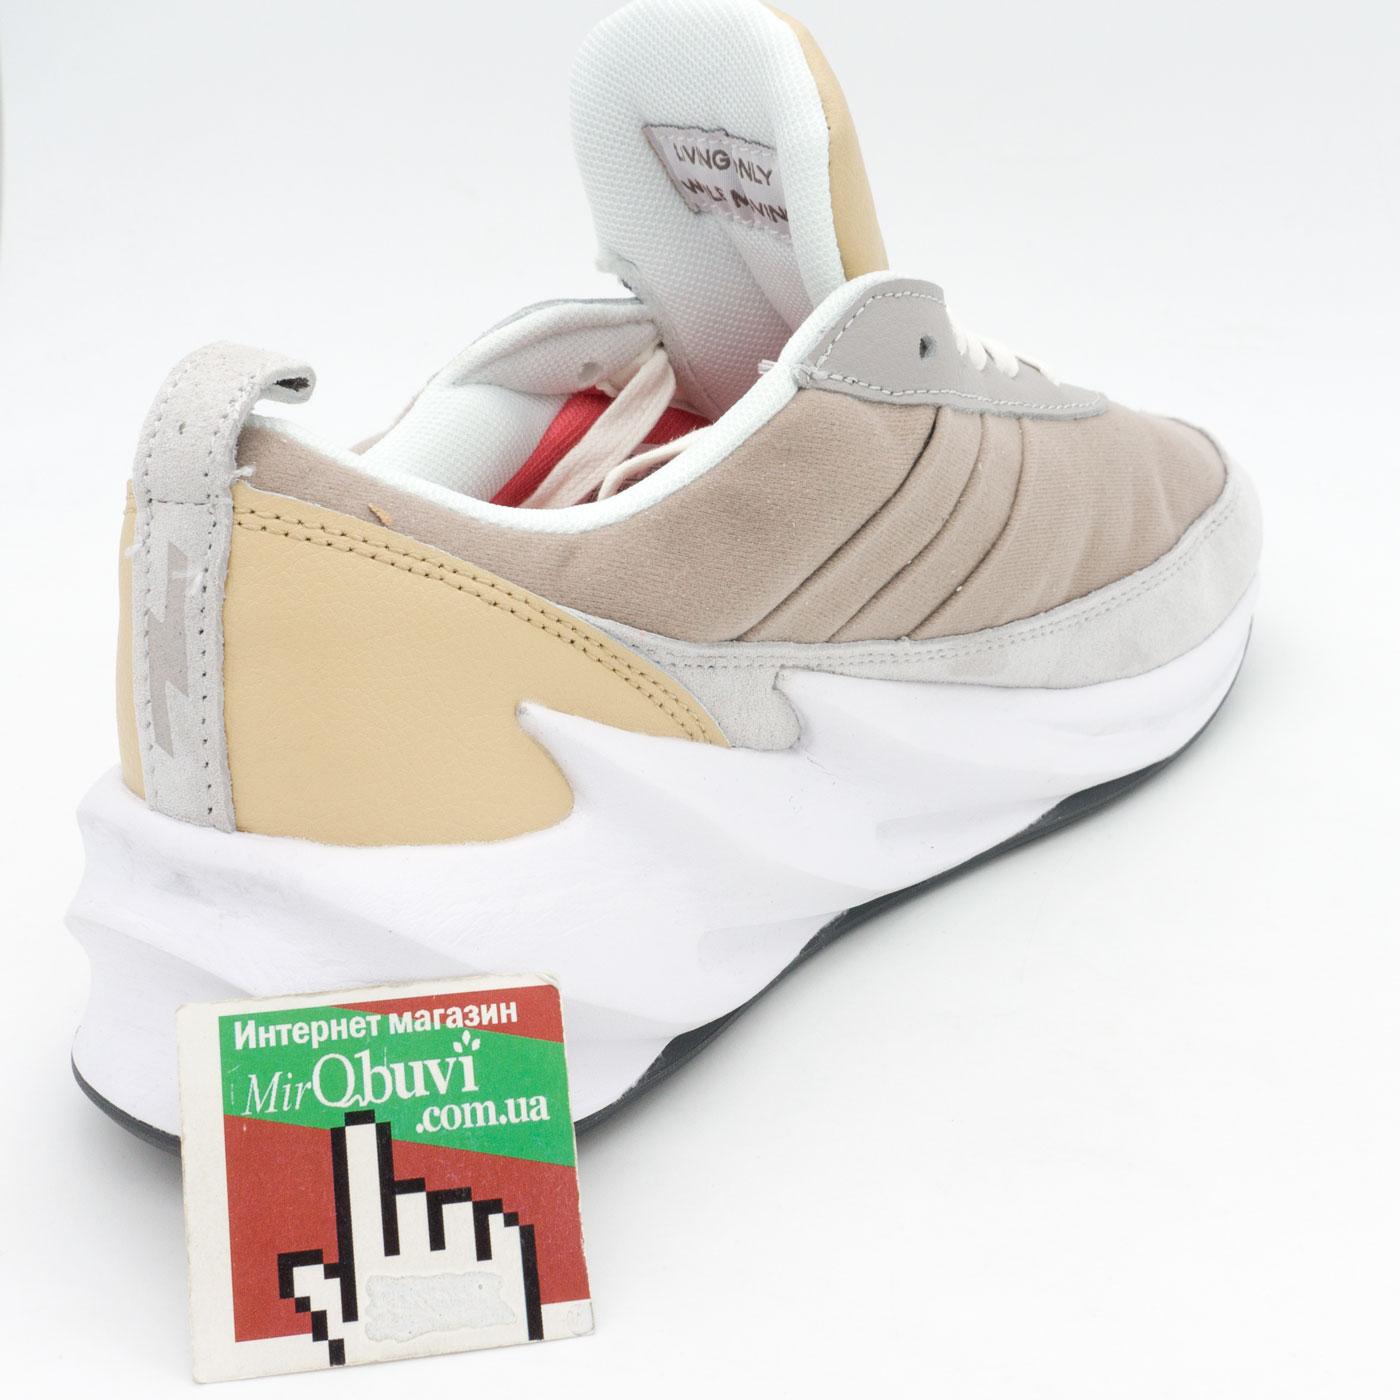 фото back Мужские кроссовки Adidas Sharks бежевые. Топ качество! back